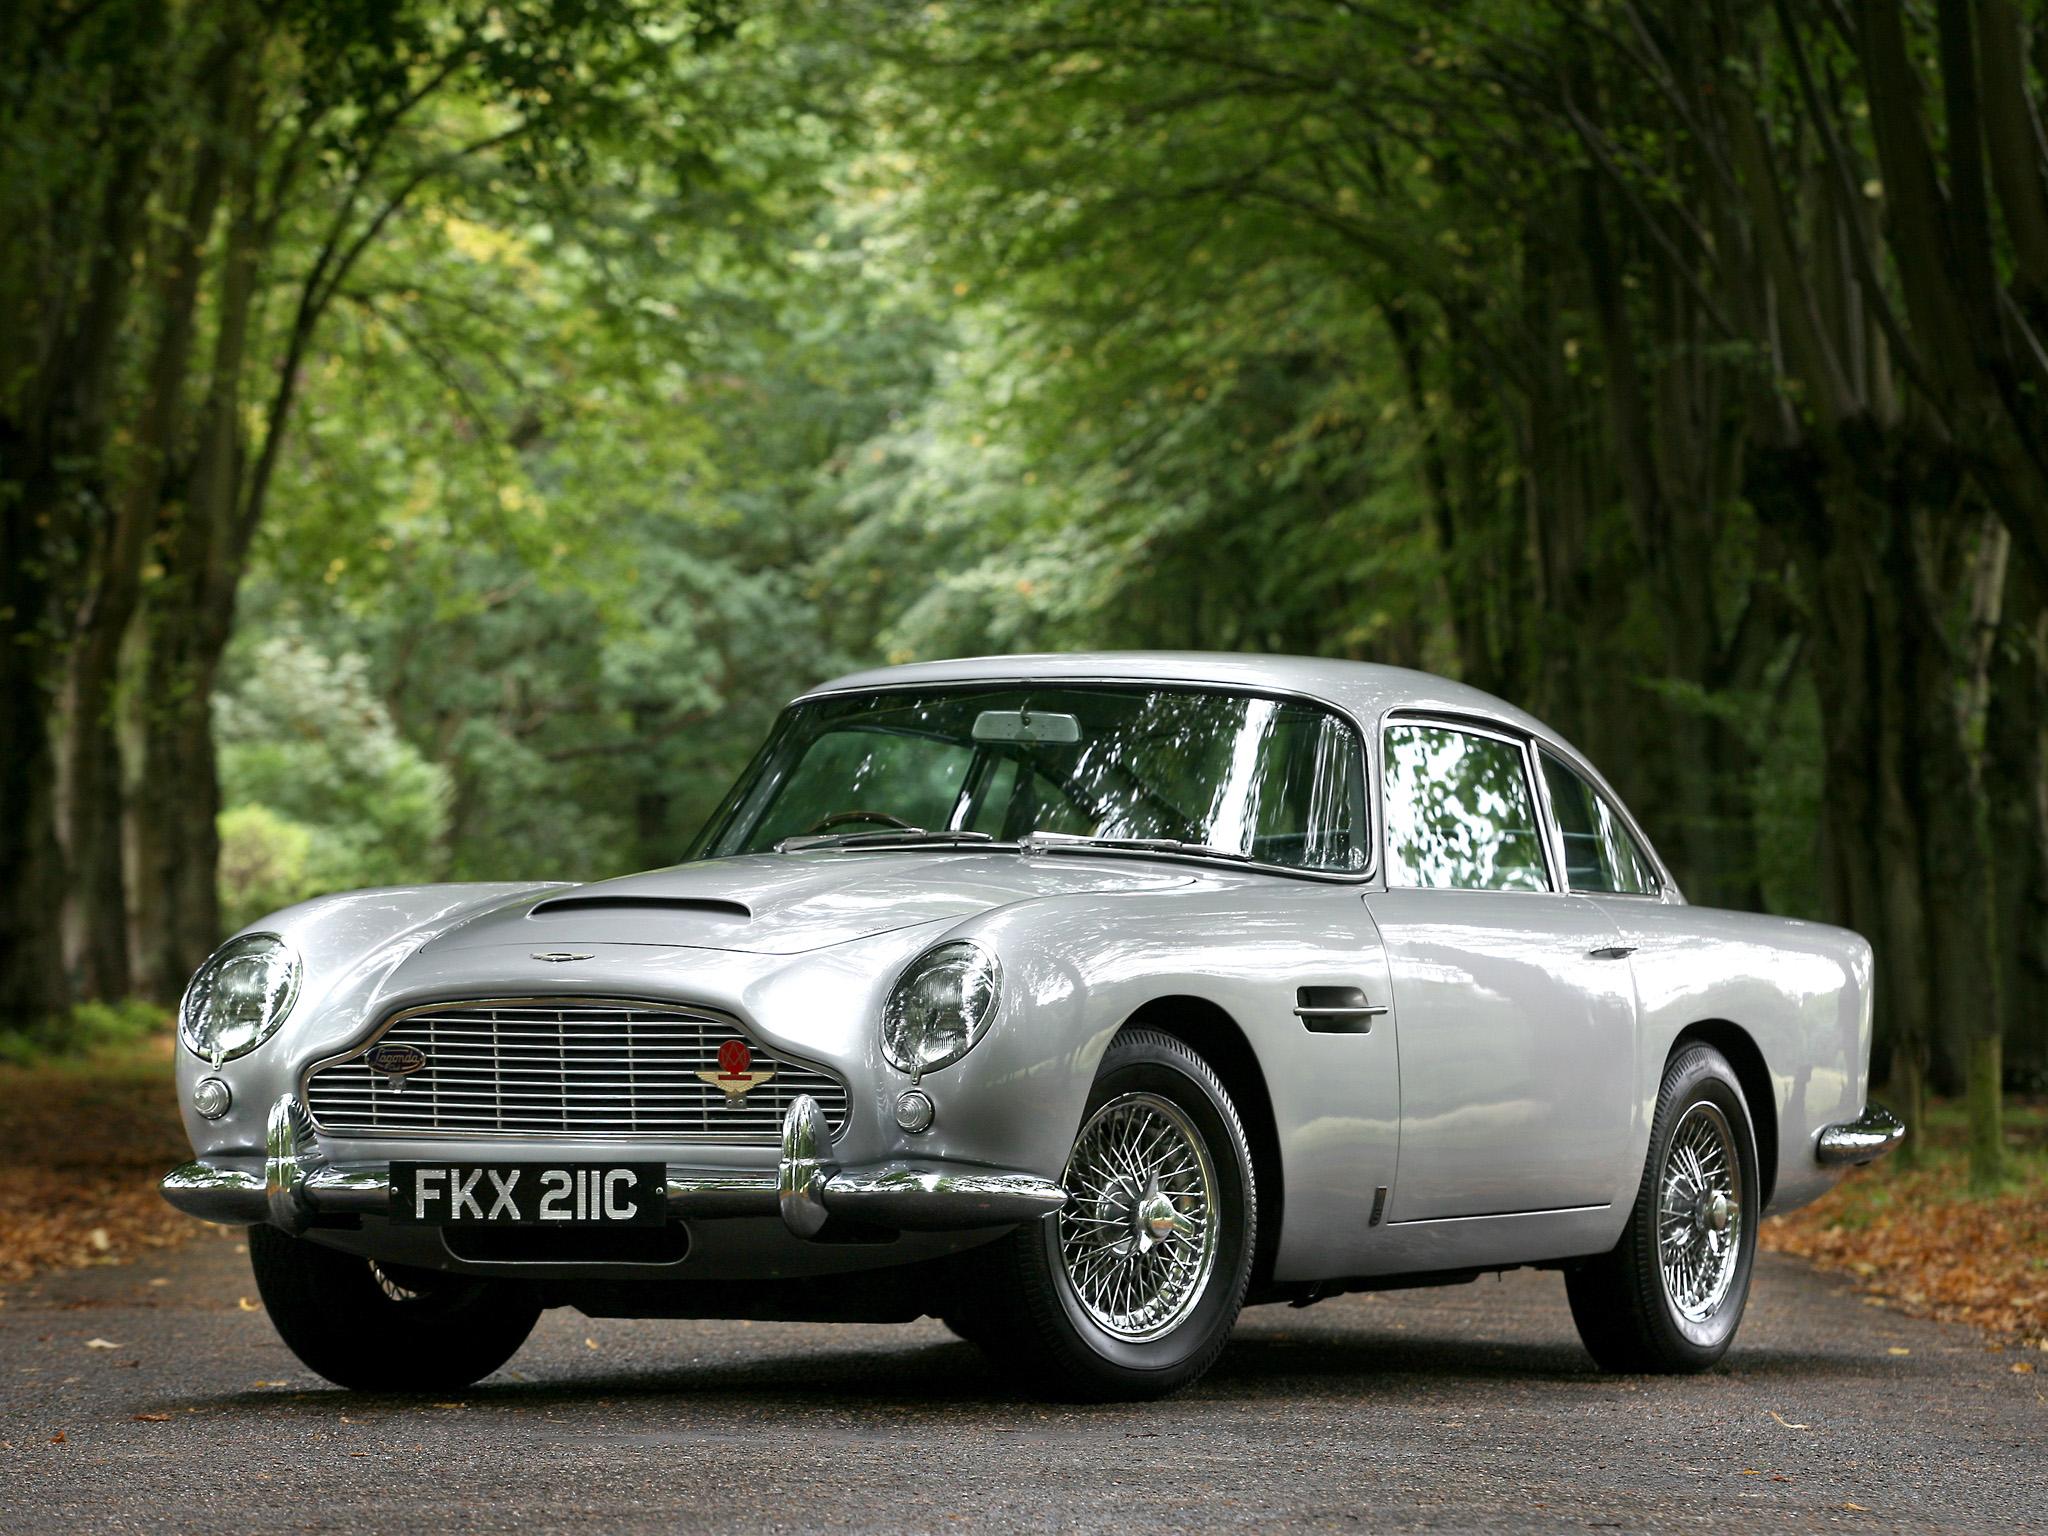 Aston Martin DB5 UK spec 19631965 wallpaper 2048x1536